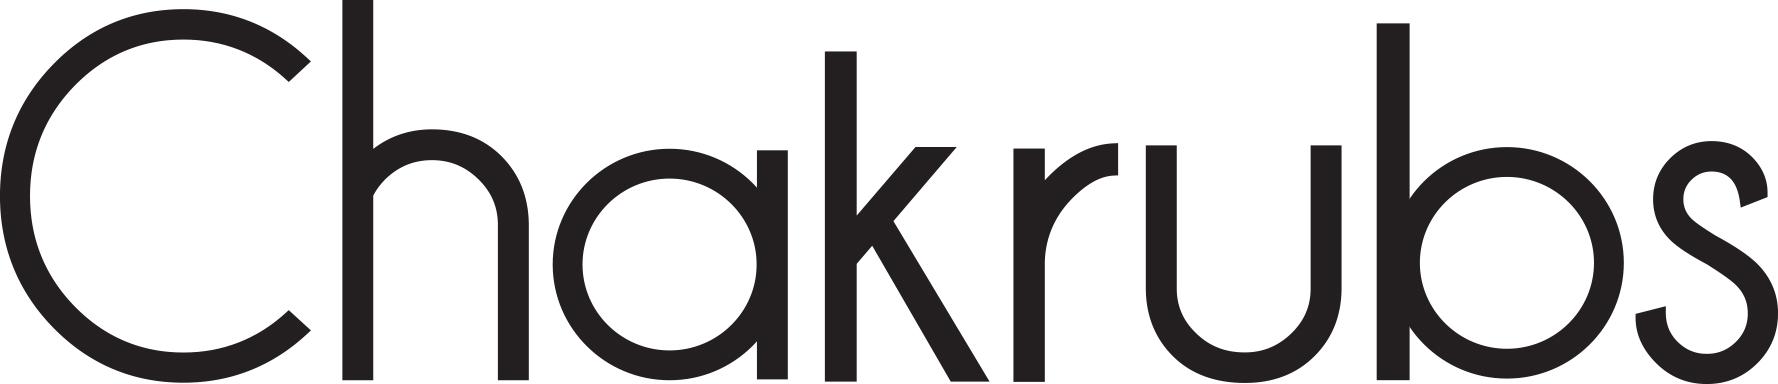 Chakrubs logo